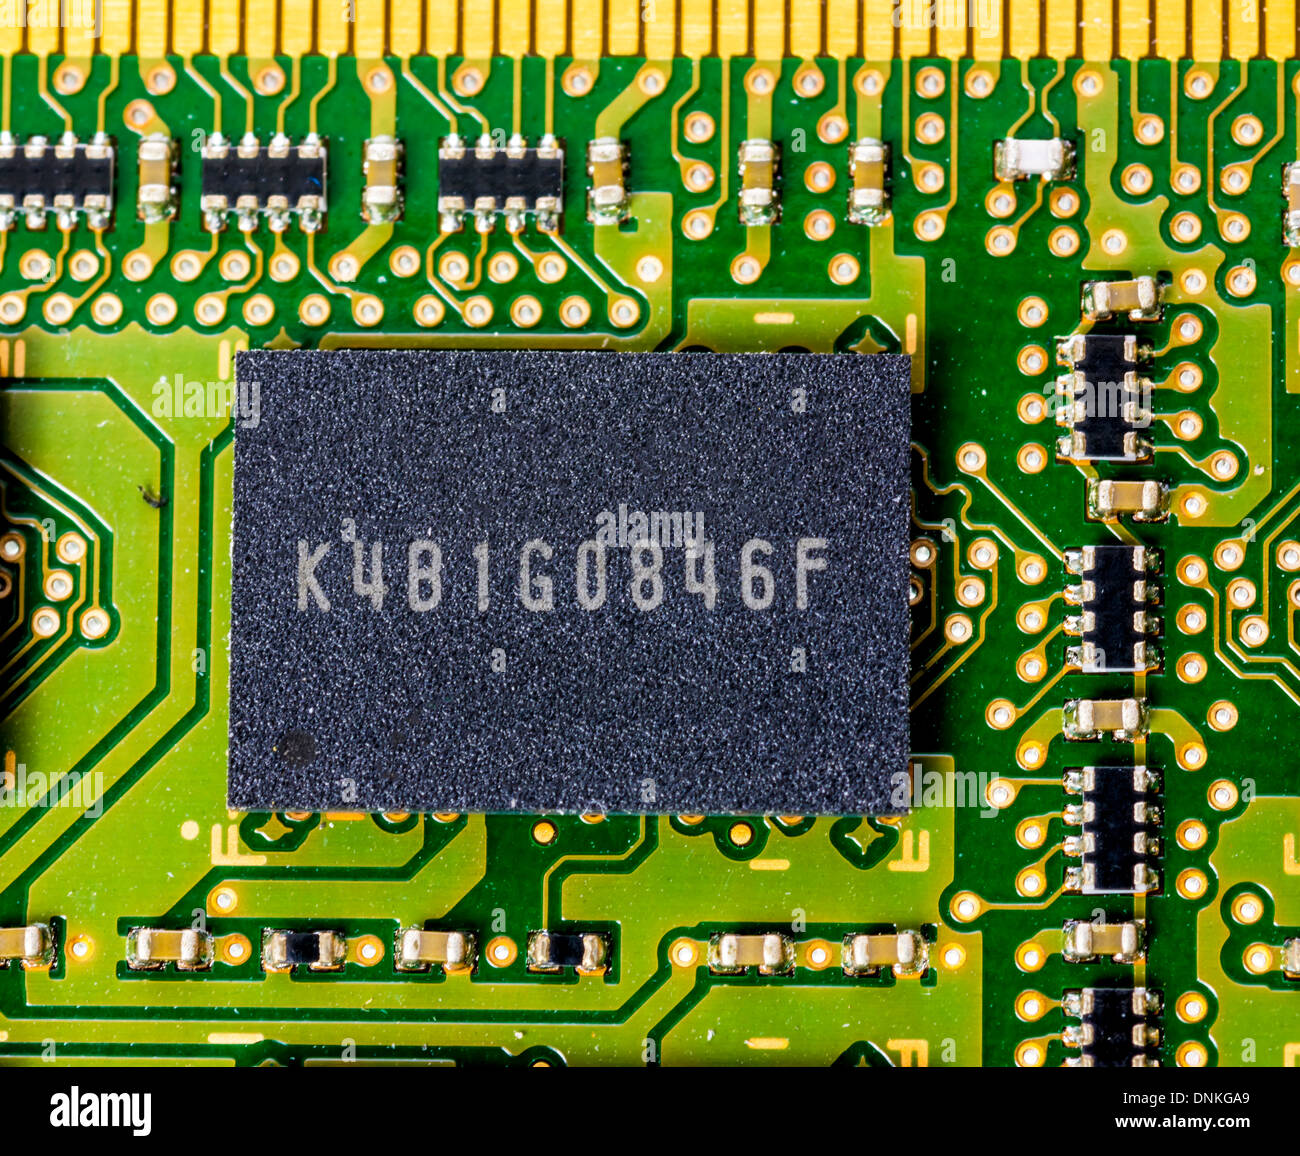 Close up of computer electronics - Stock Image